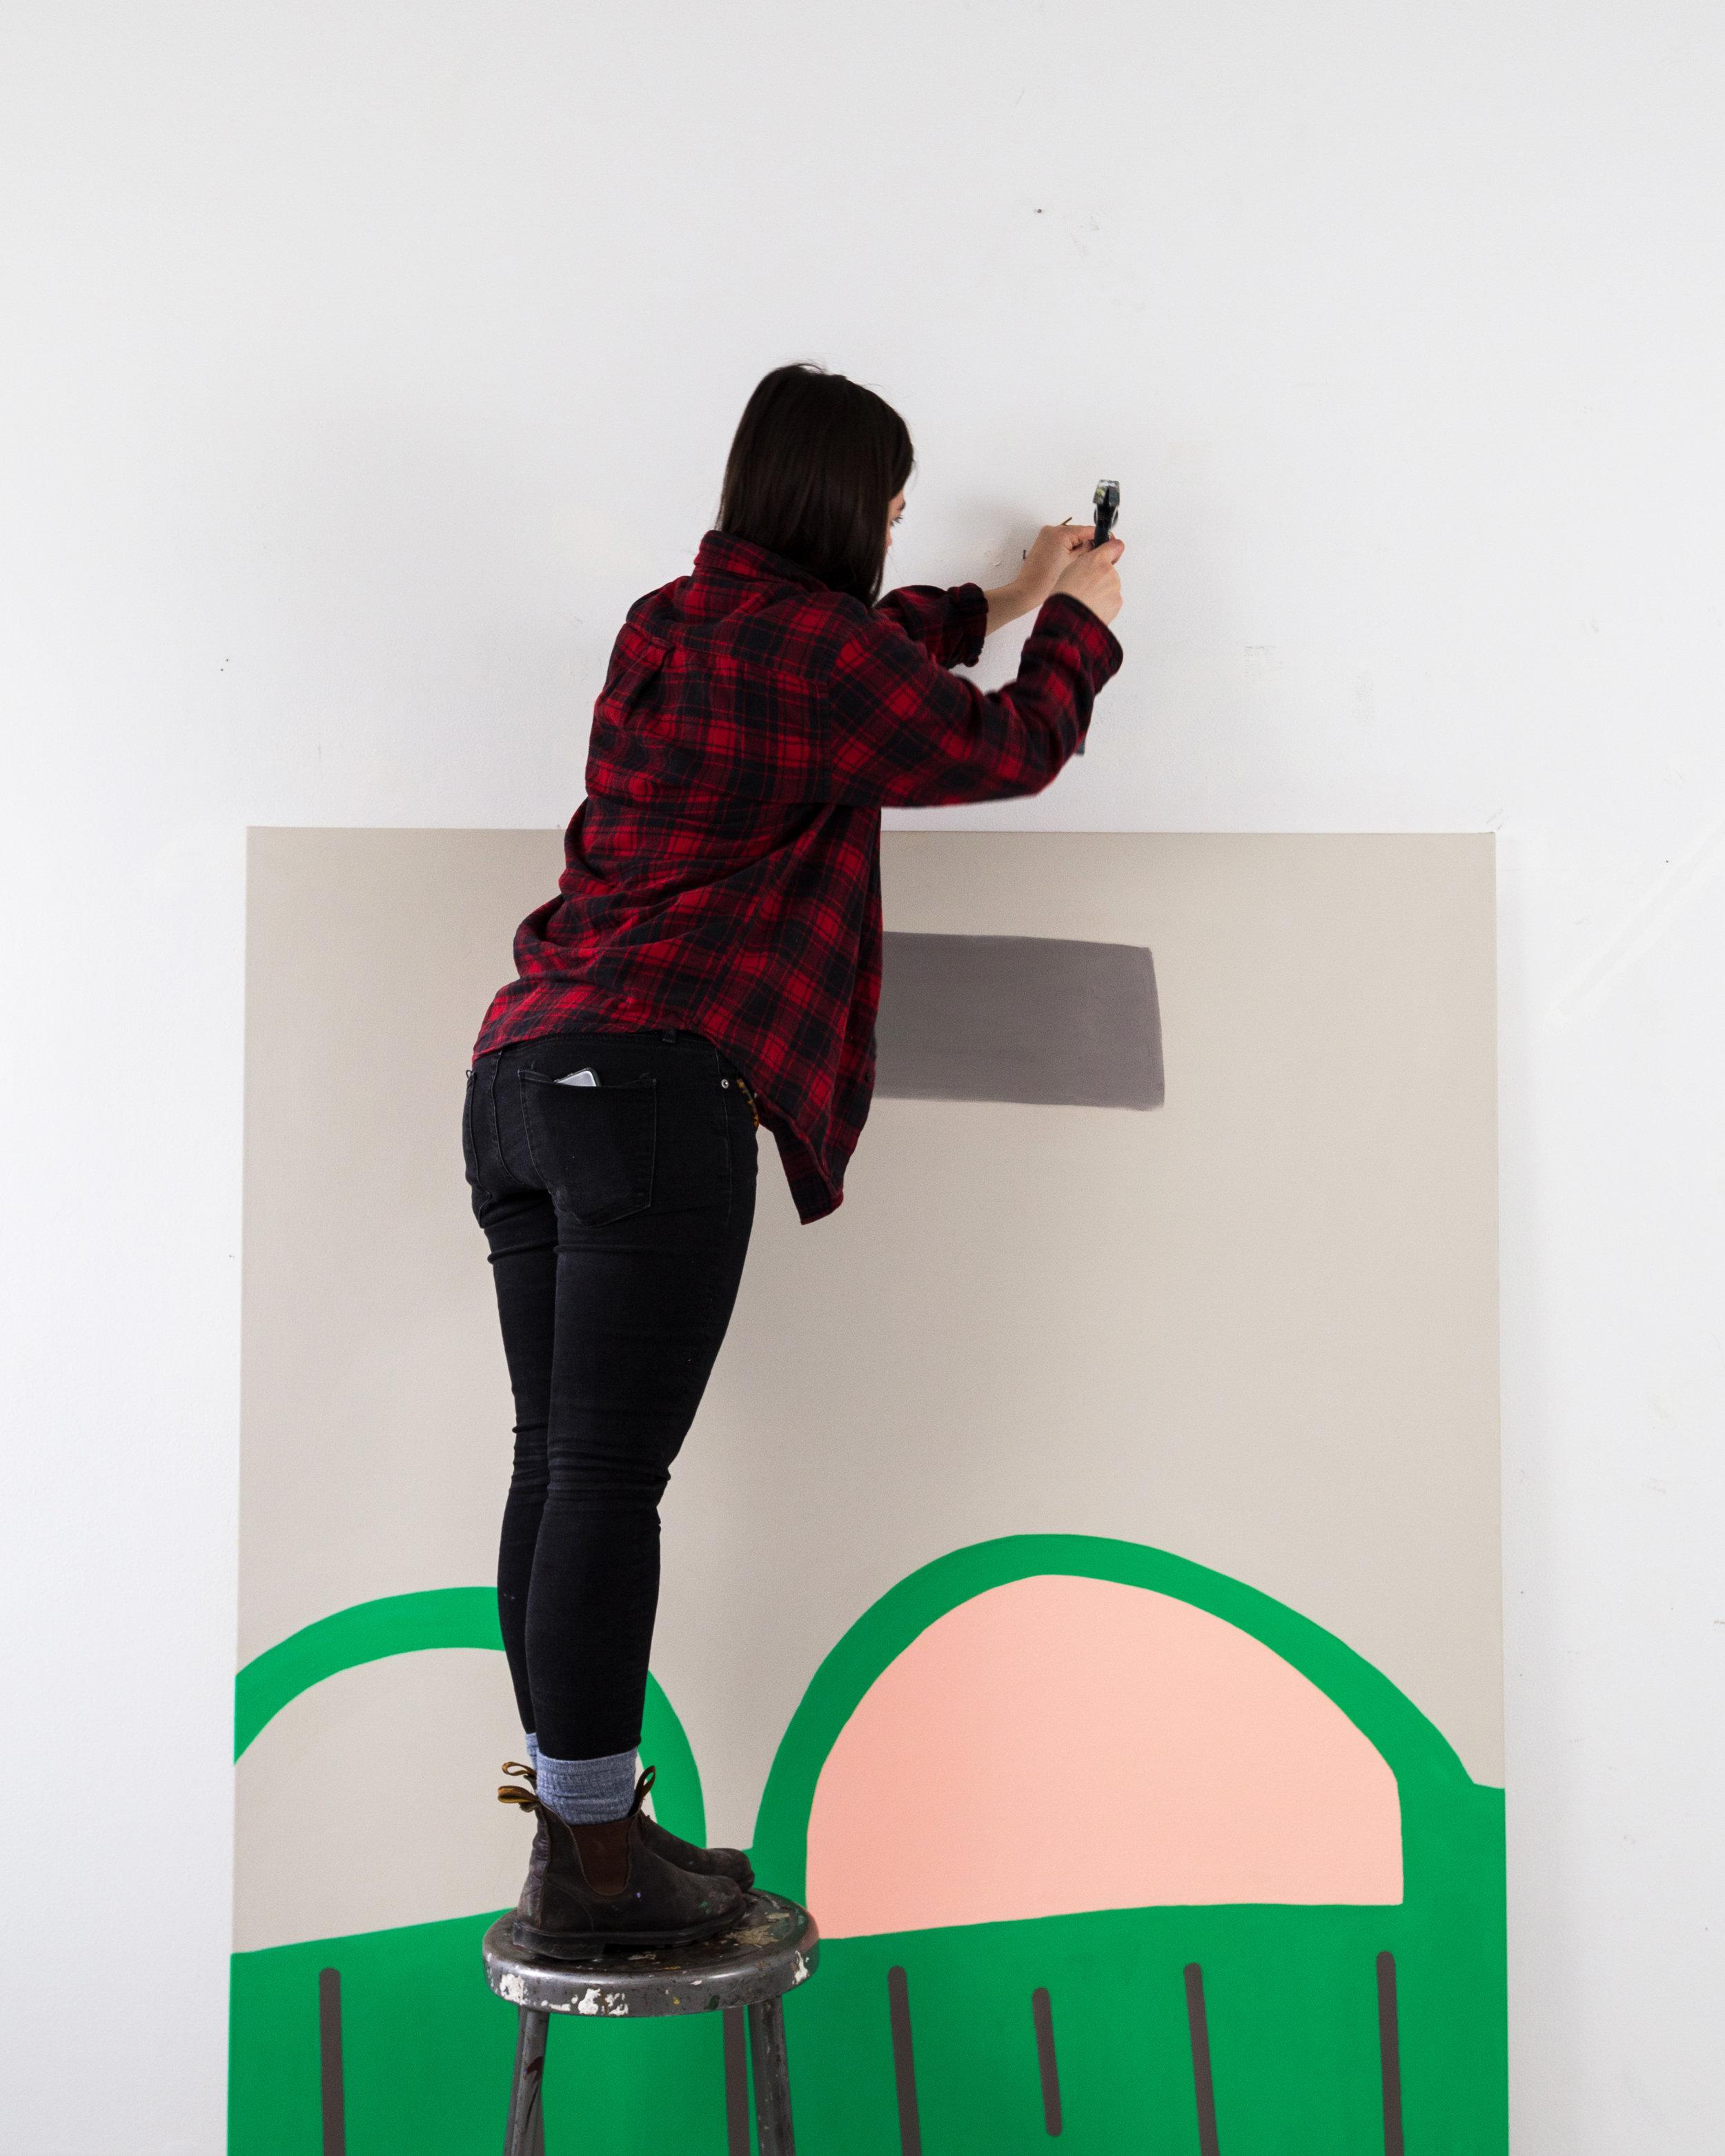 Emma Carney, MOTHER F****N' ARTIST